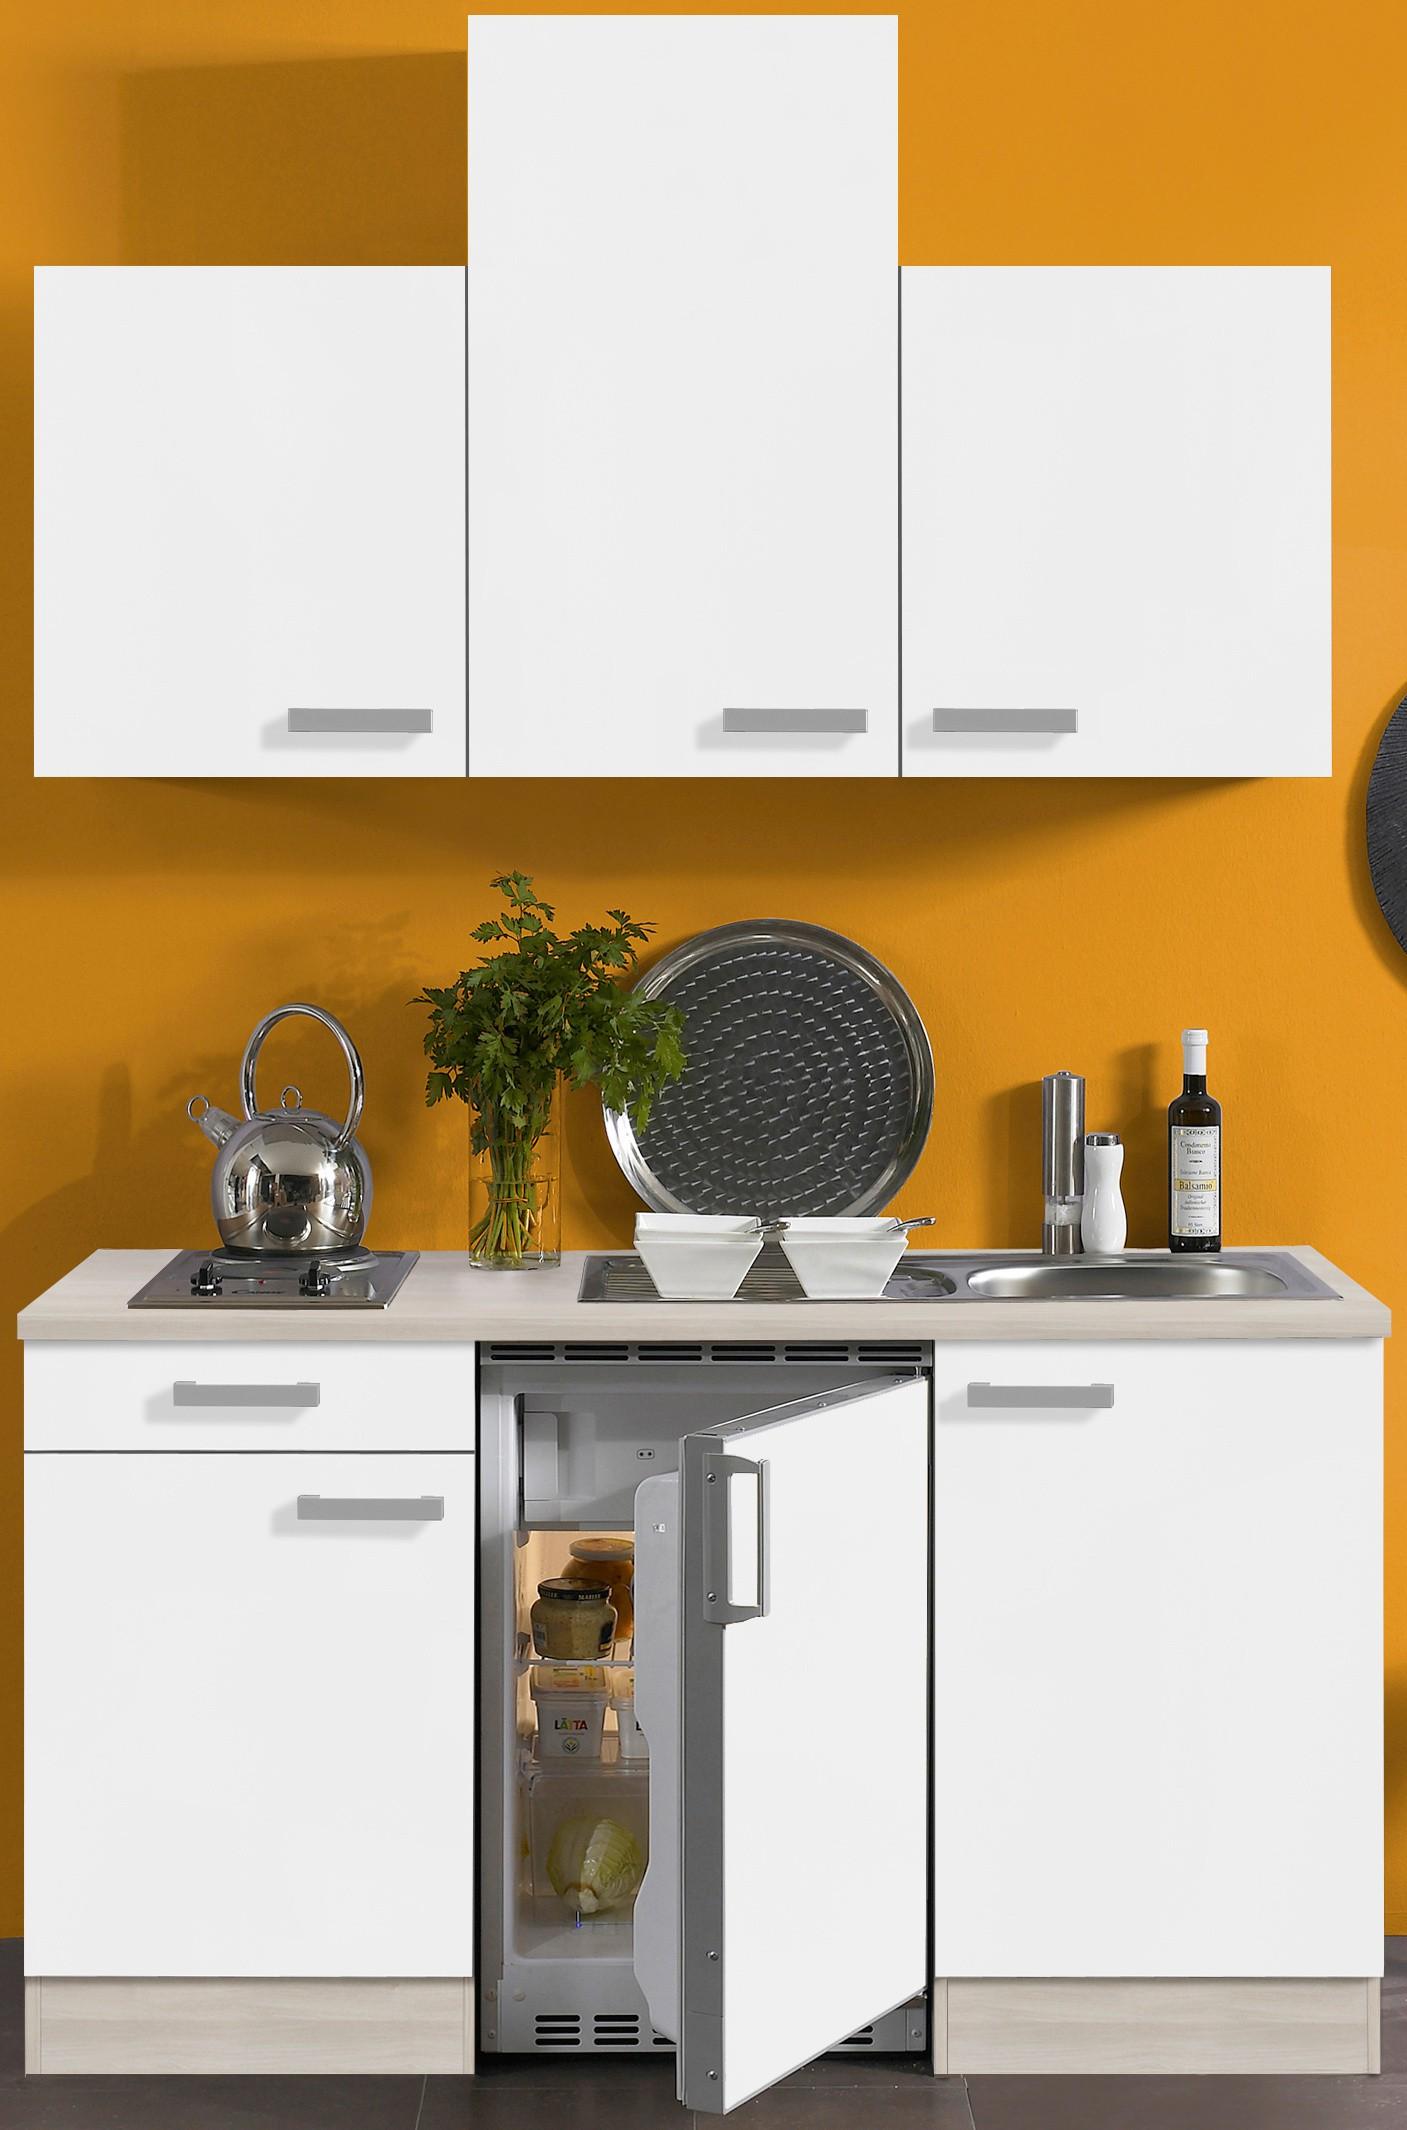 singlek che barcelona vario 2 mit elektro kochfeld breite 150 cm wei k che. Black Bedroom Furniture Sets. Home Design Ideas